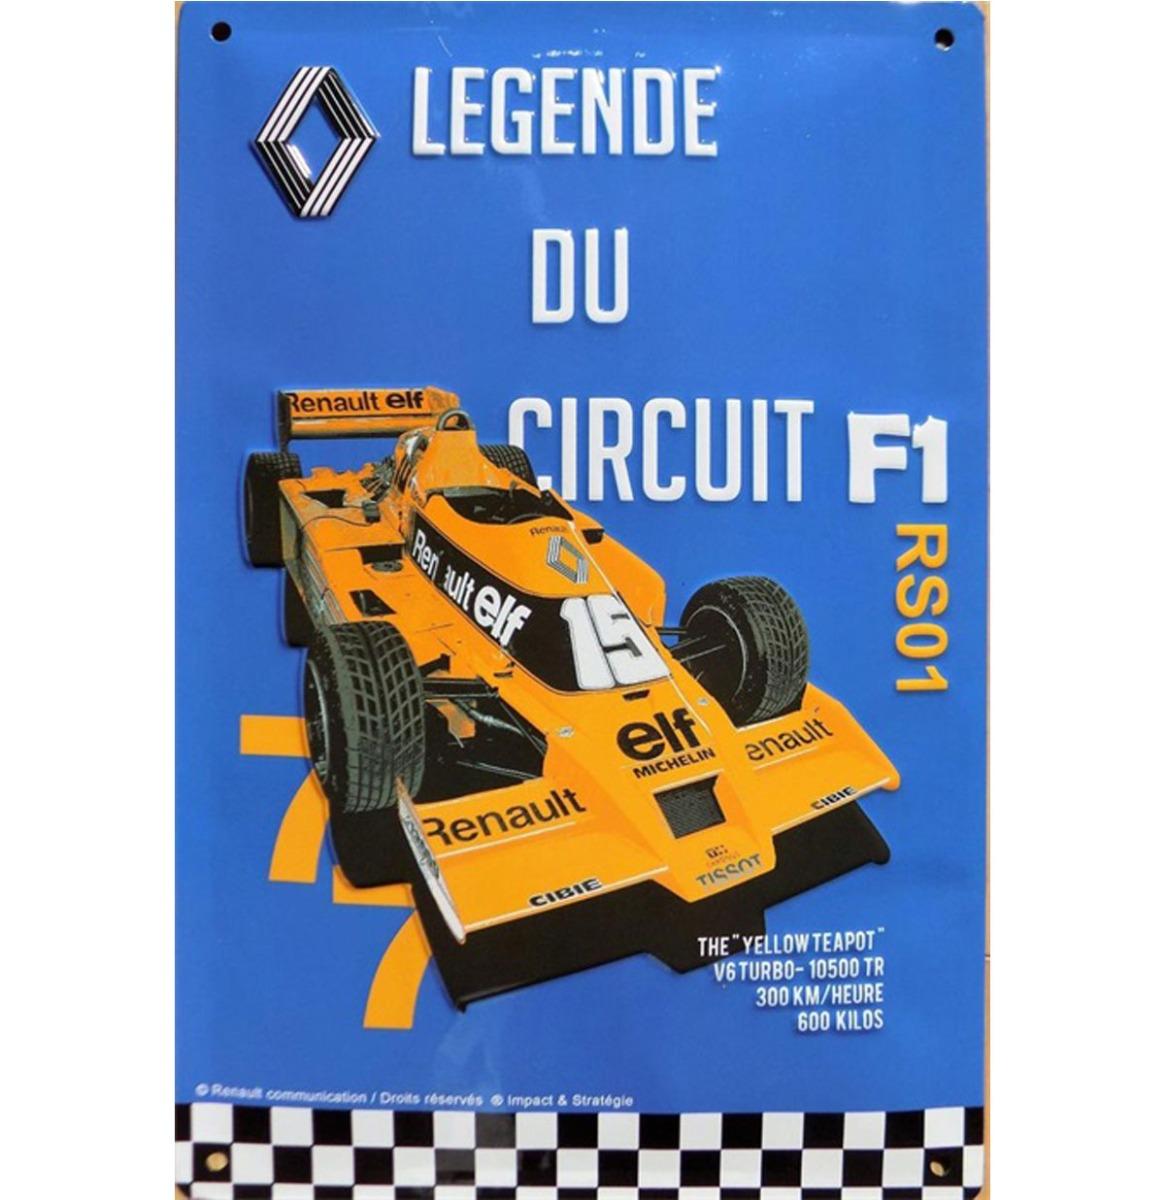 Metalen Bord RA 40x30cm Renault F1 Legende